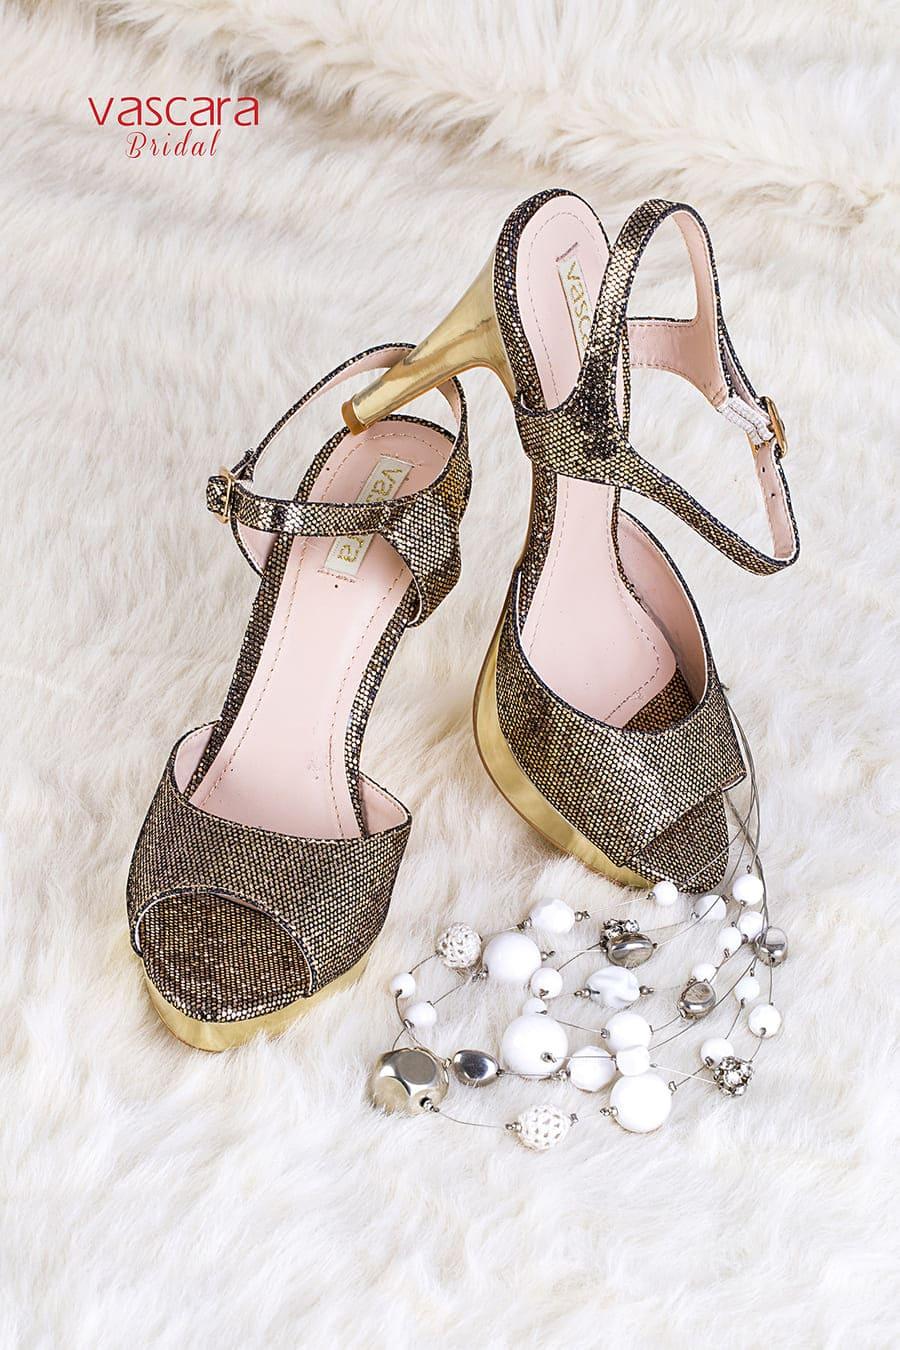 Giày cưới Vascara